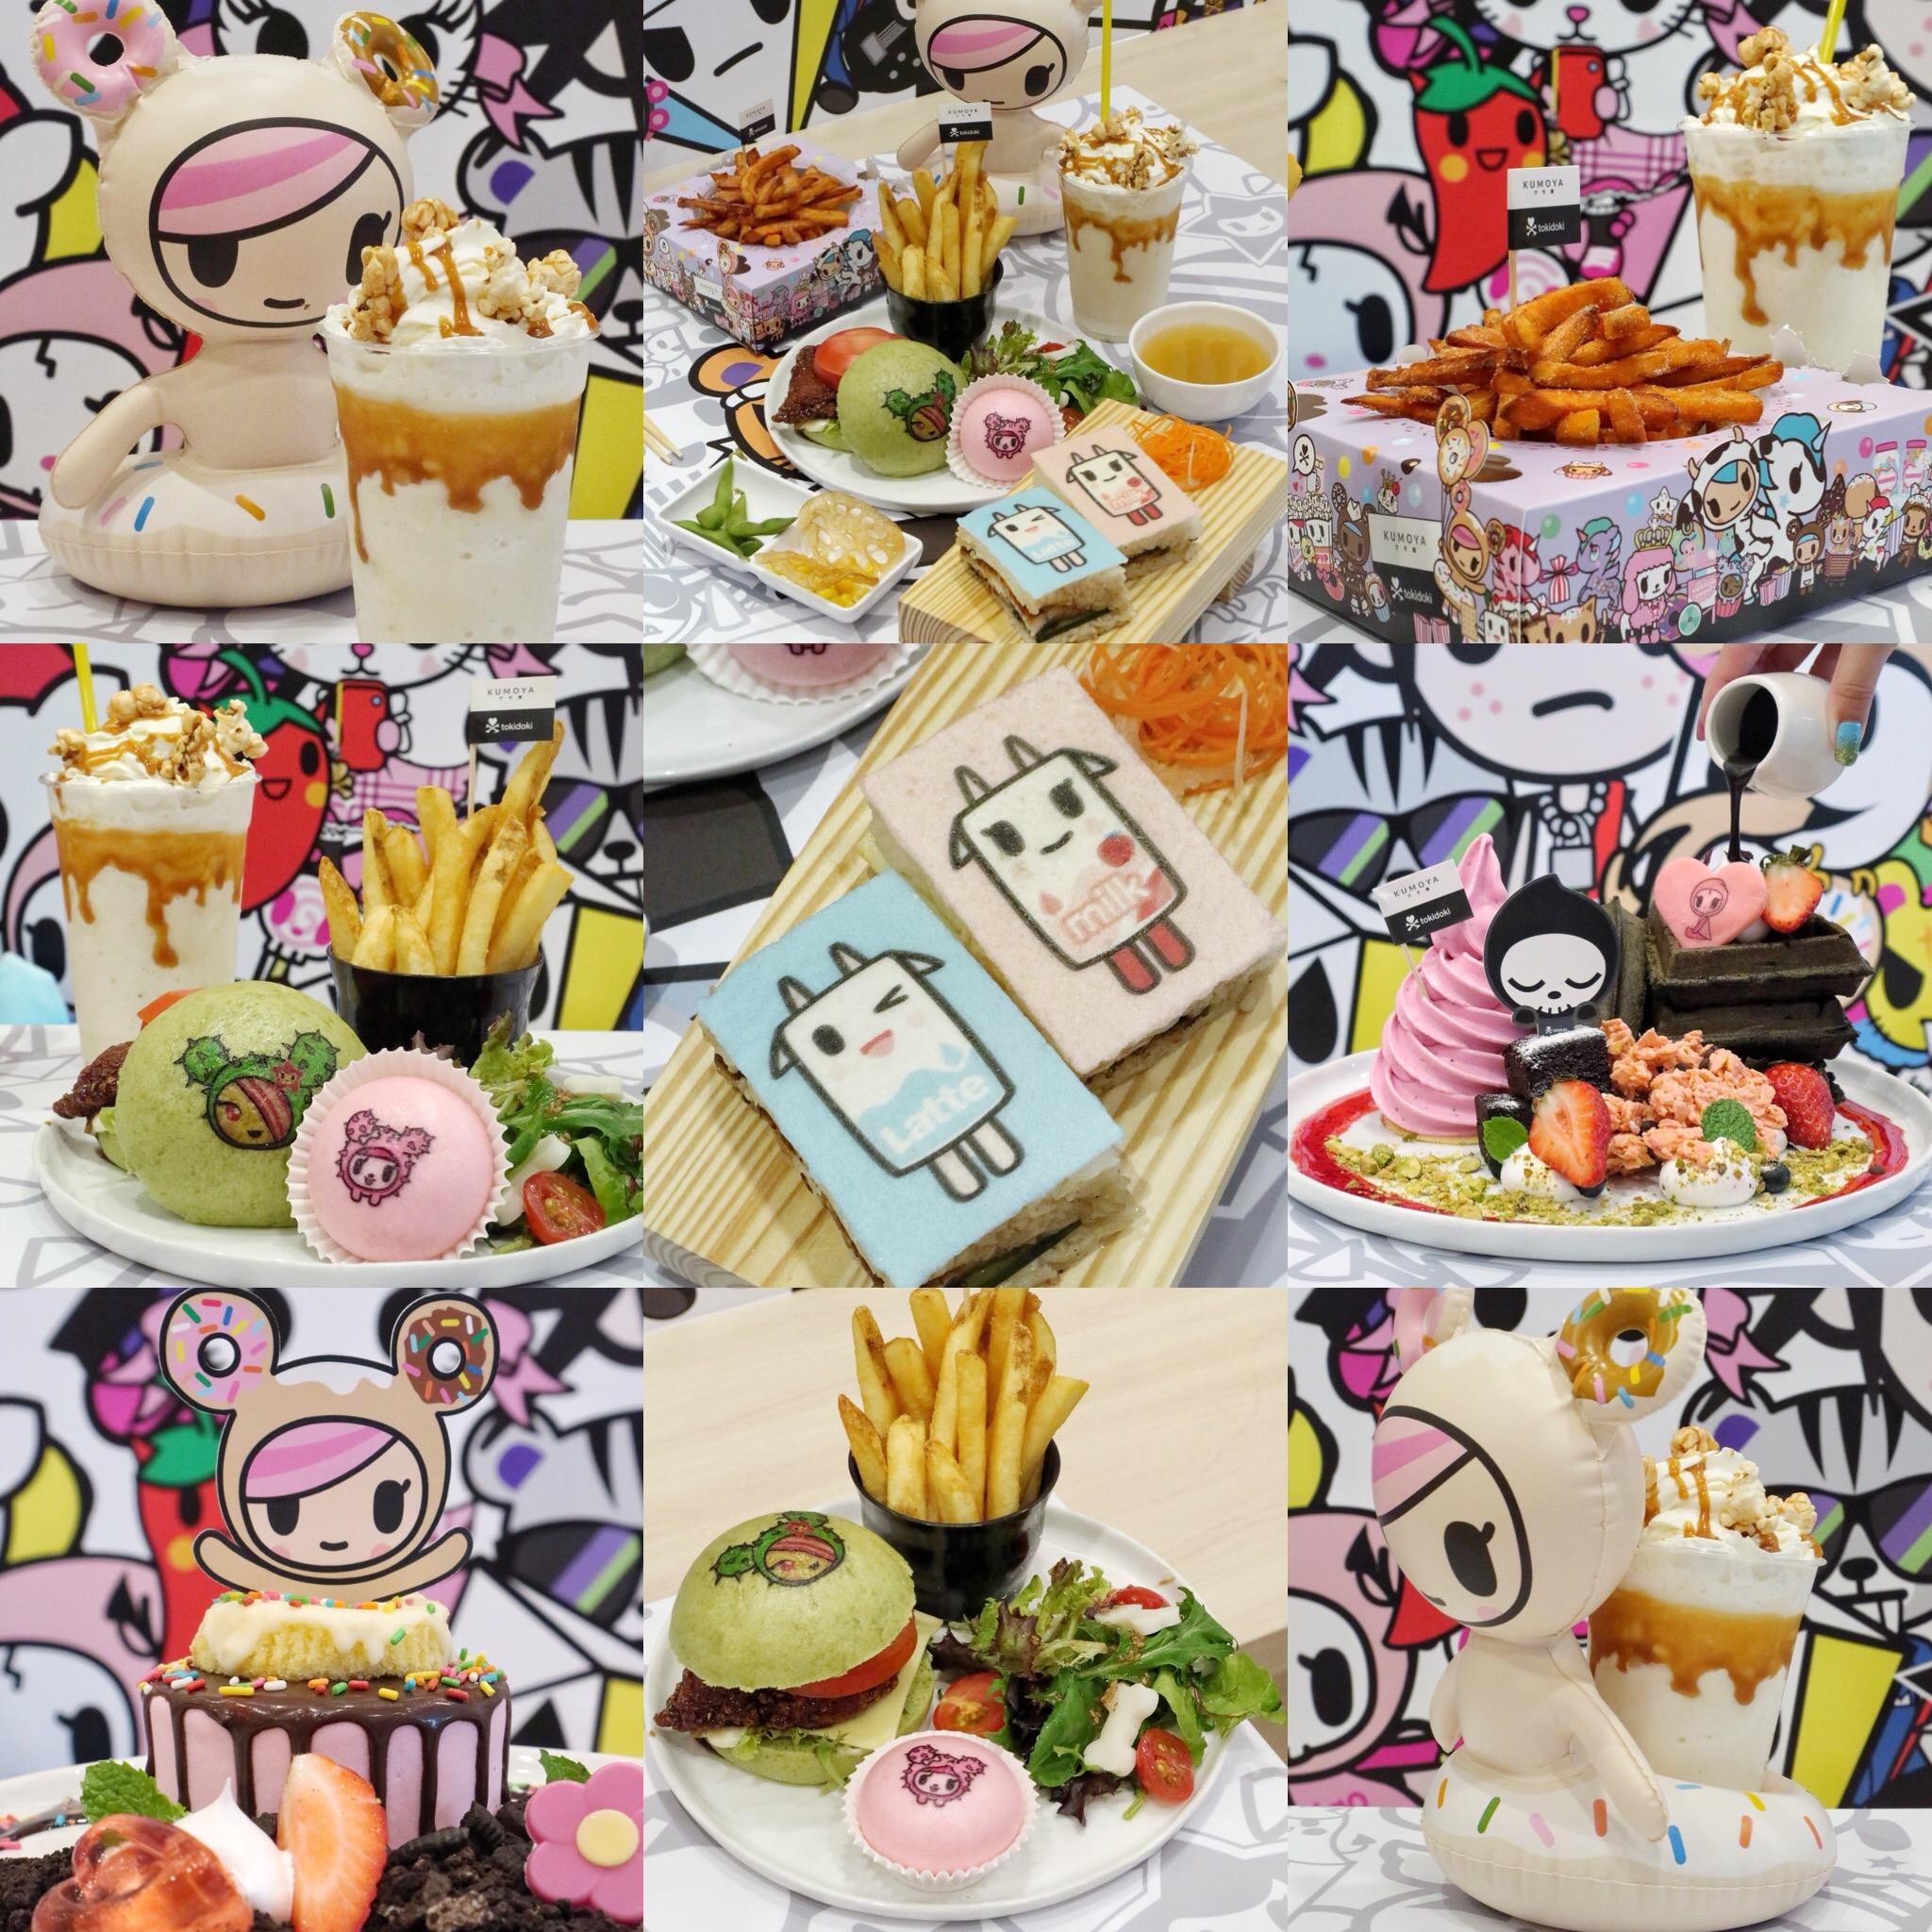 (NEW) Kumoya Singapore: Welcomes World's First Tokidoki Pop-Up Café (from now till end June)